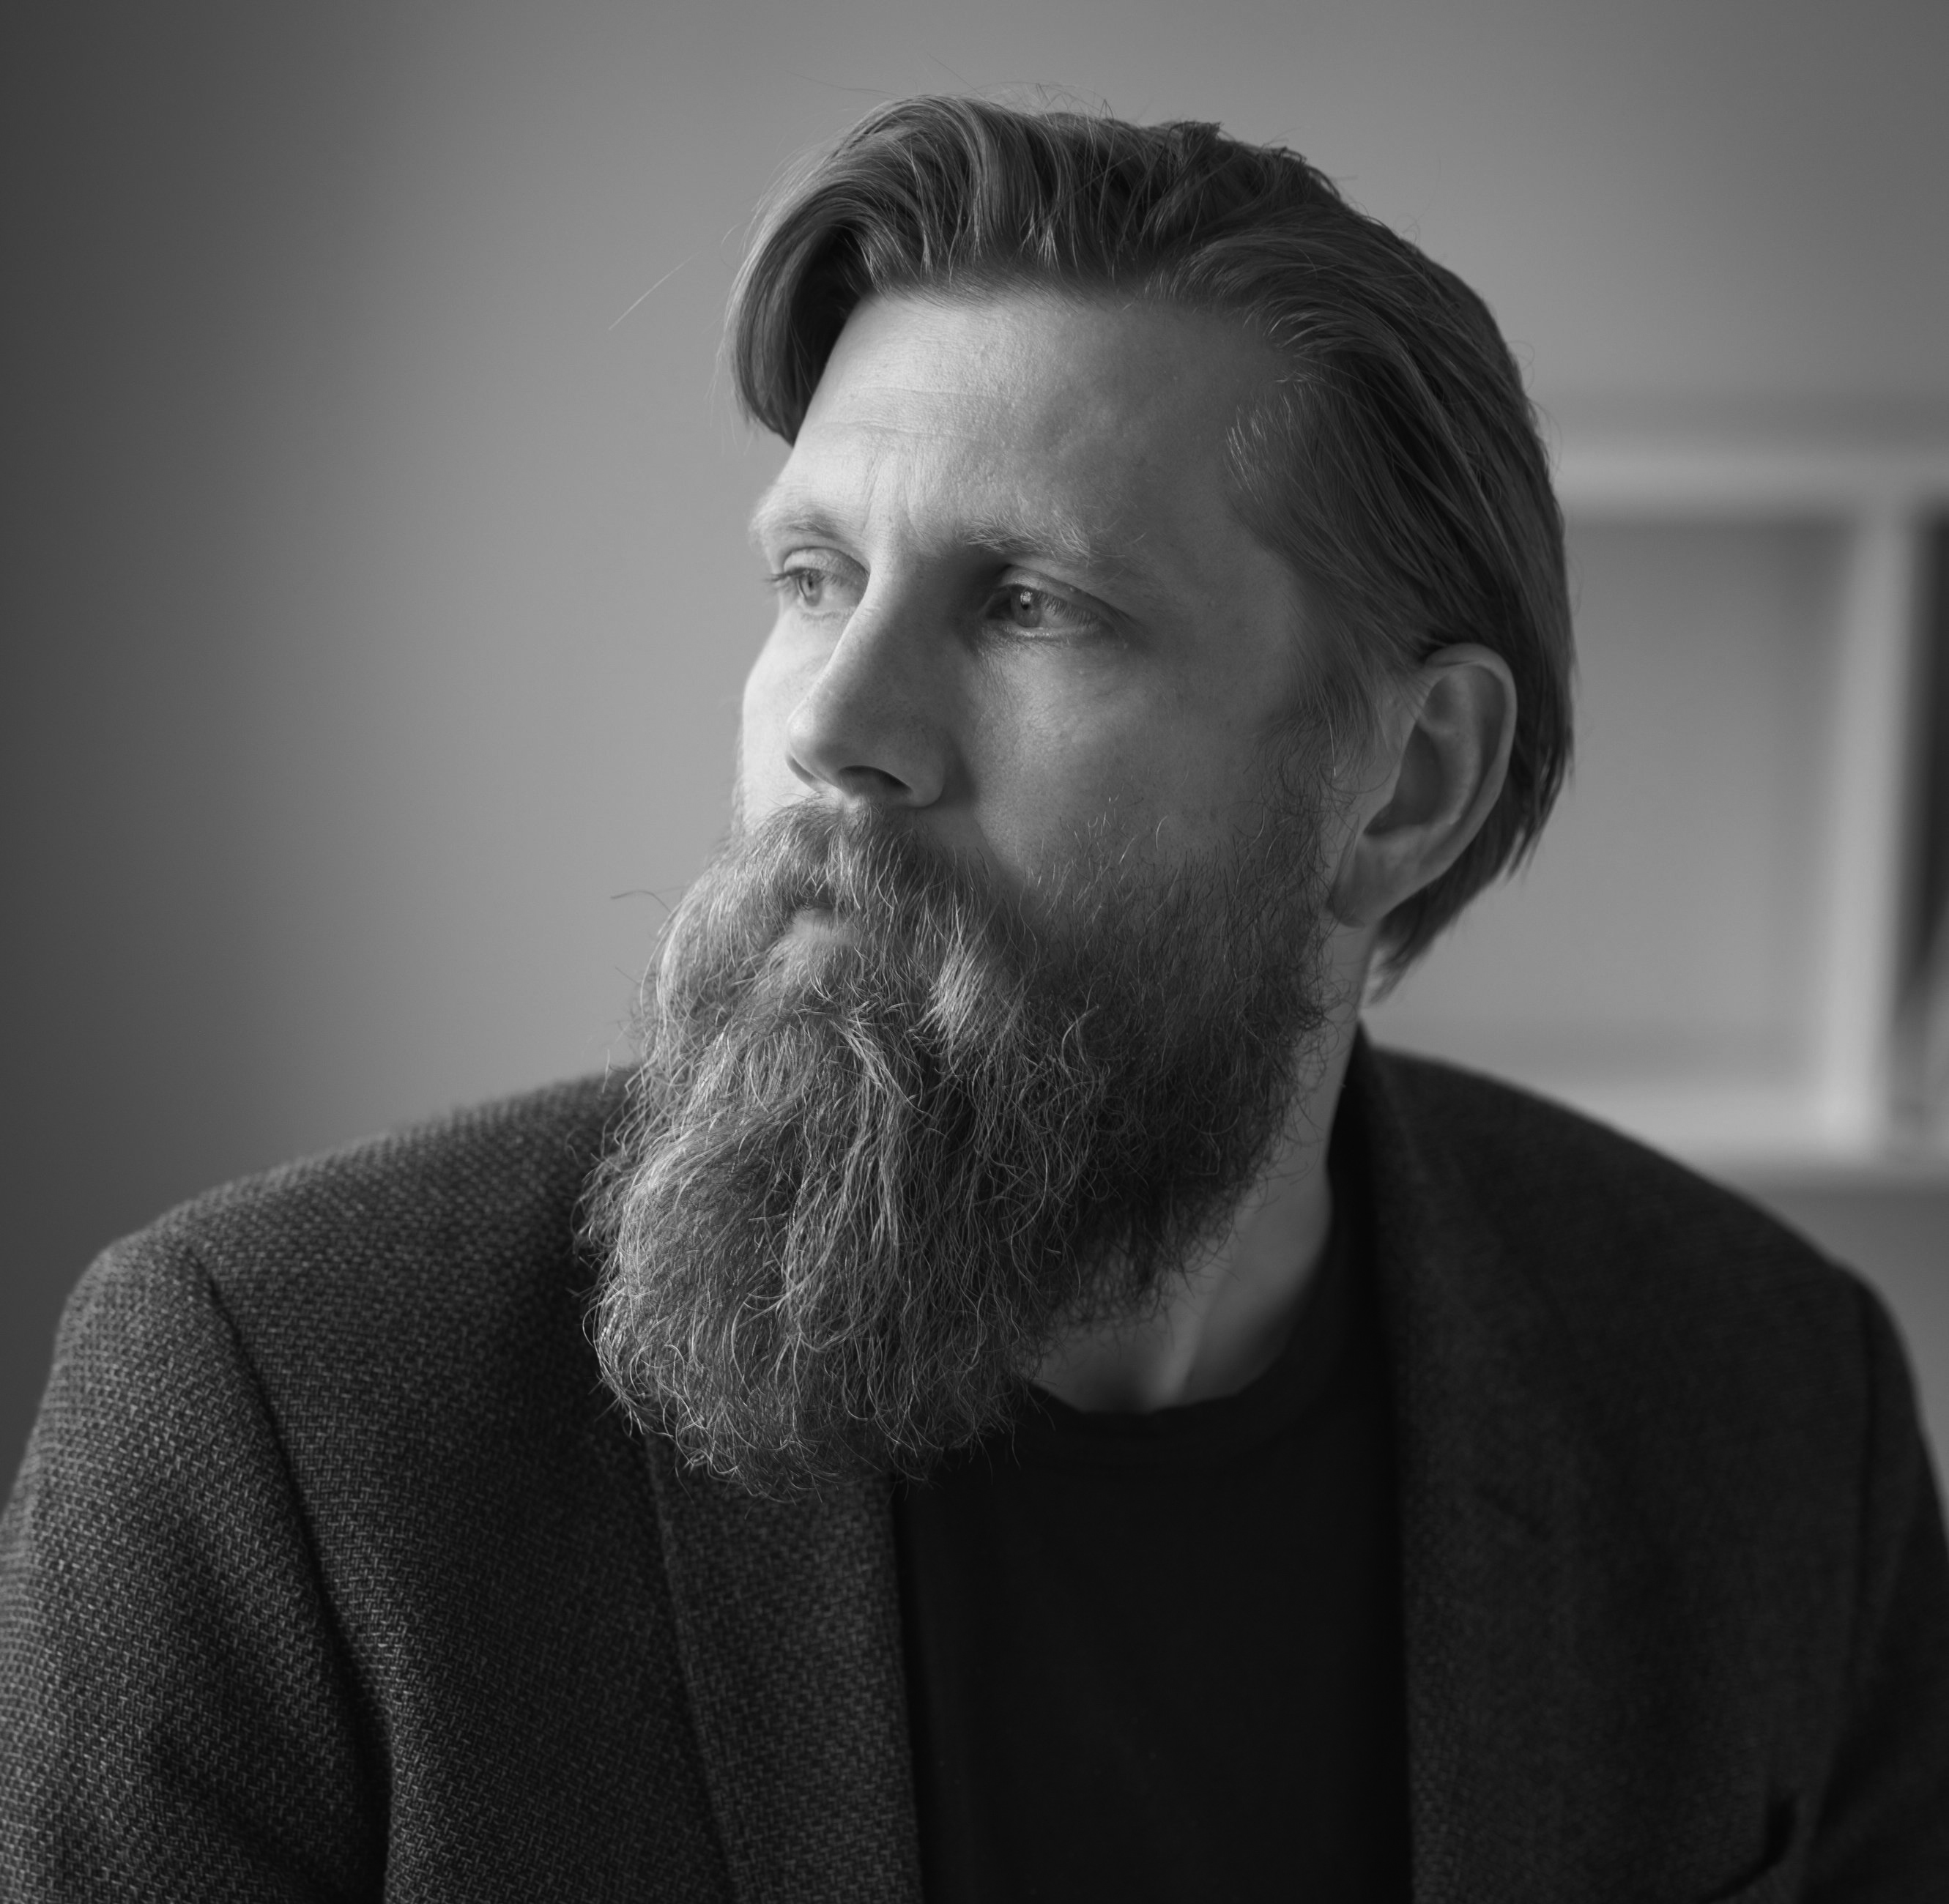 Johannes-Gudmundsson-INECTA-CEO-Coffee-Mug-Tutorials-Business-Central-BW